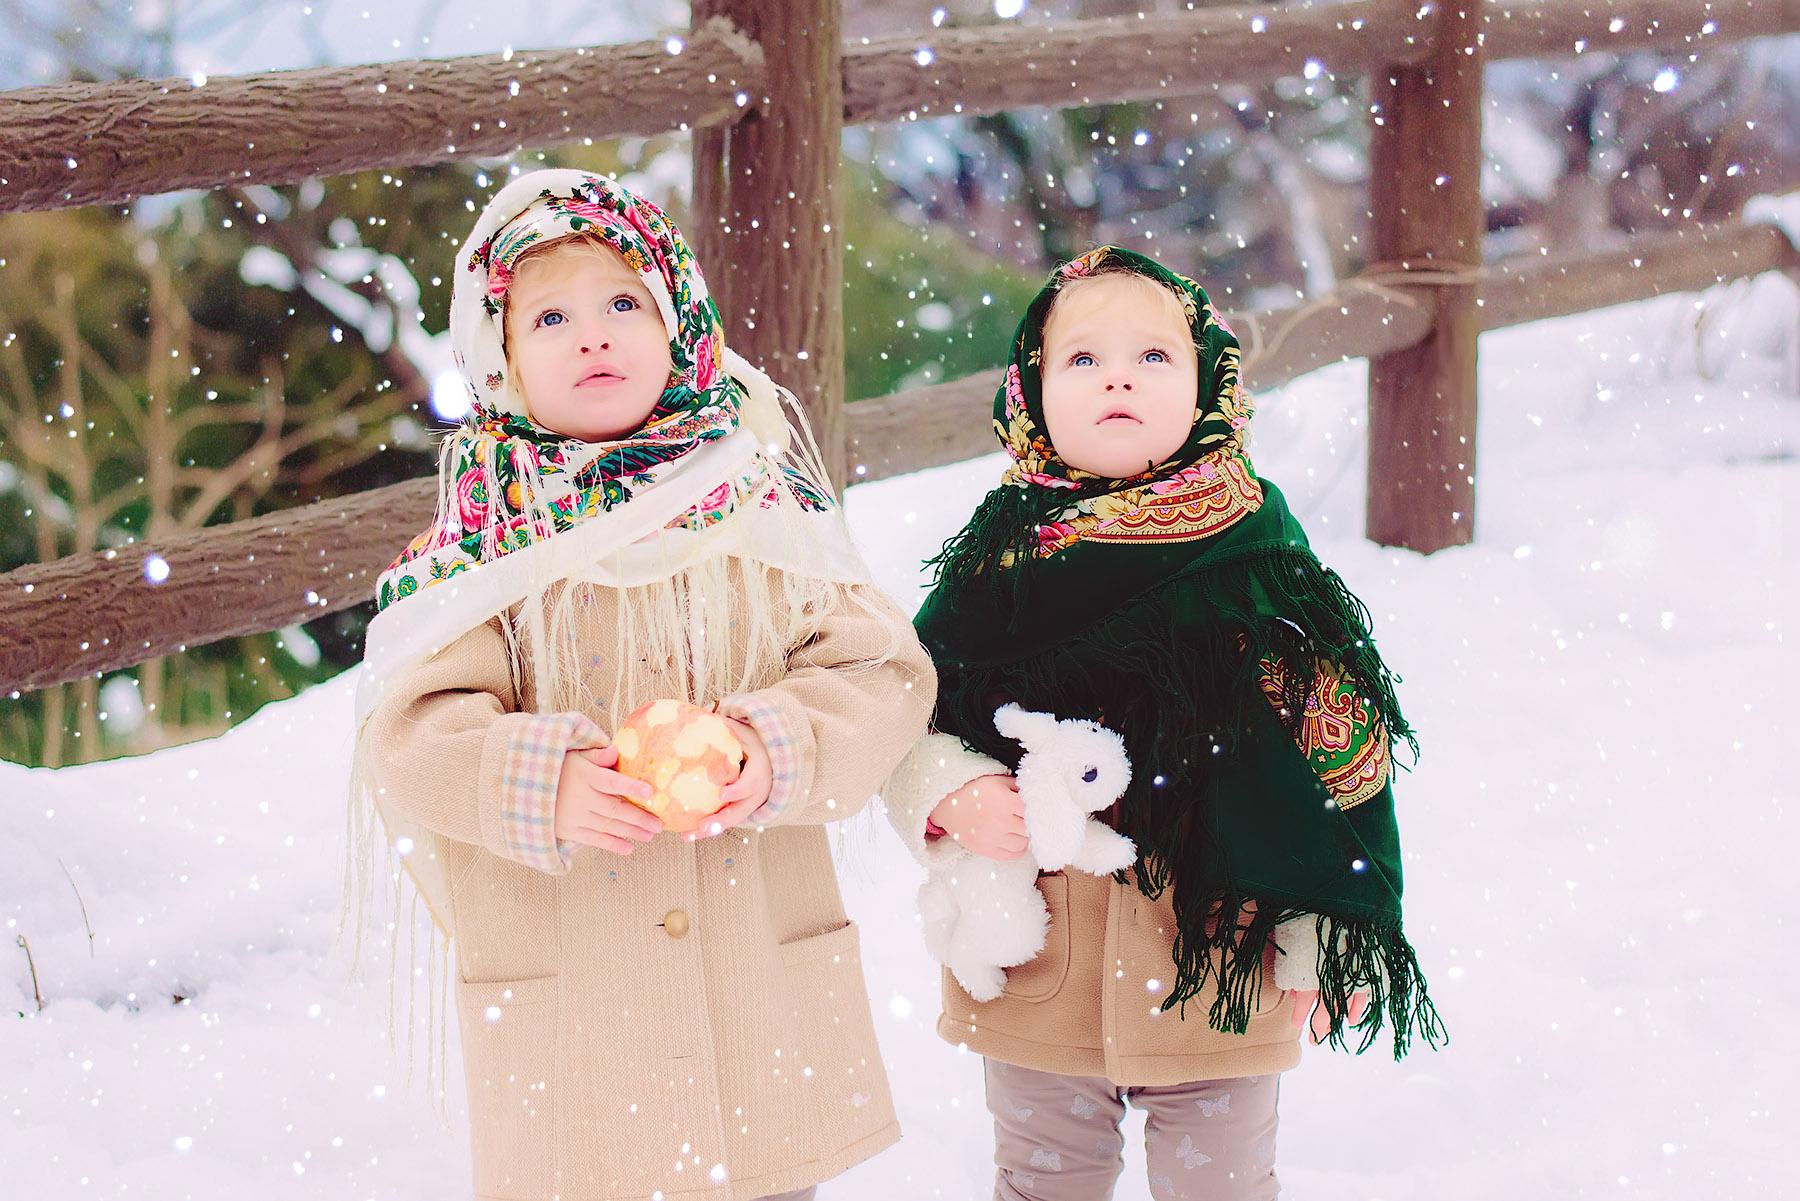 Russian cuties